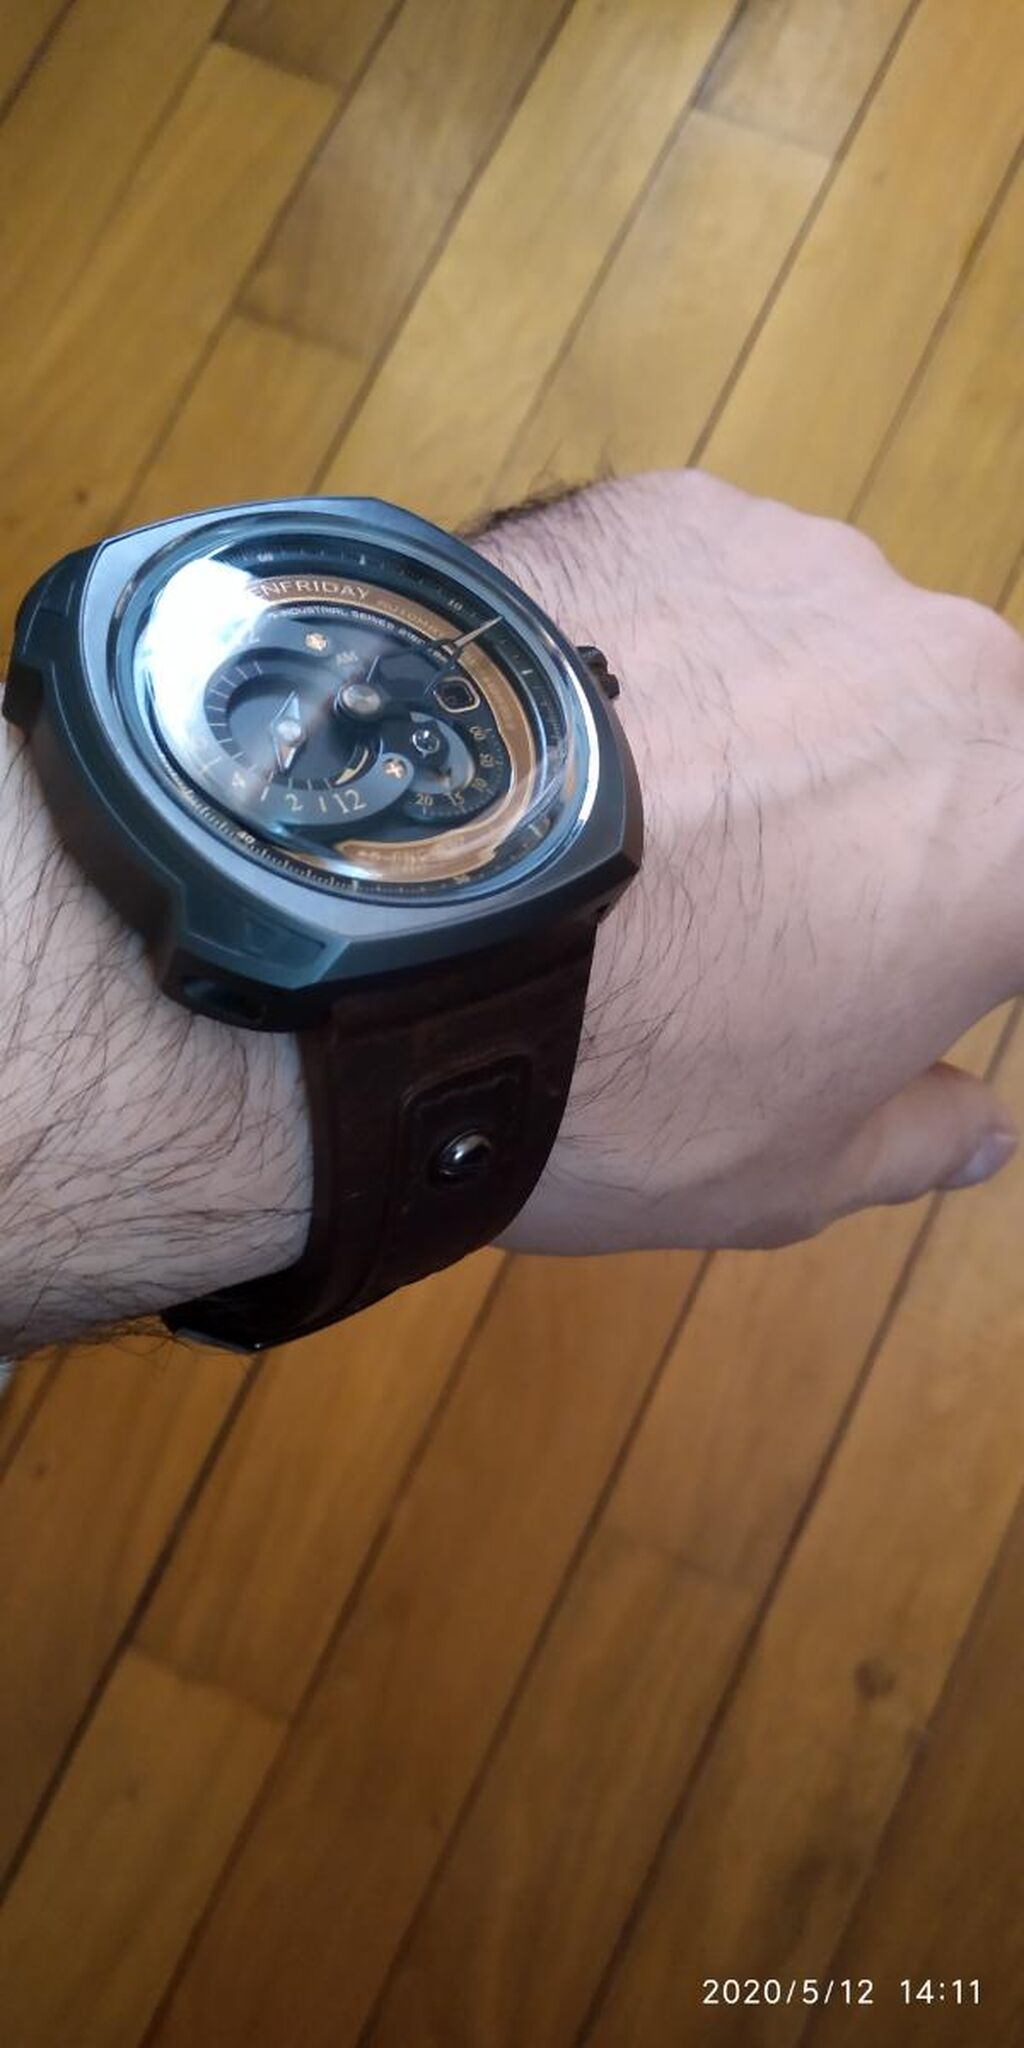 Kişi Qol saatları Sevenfriday